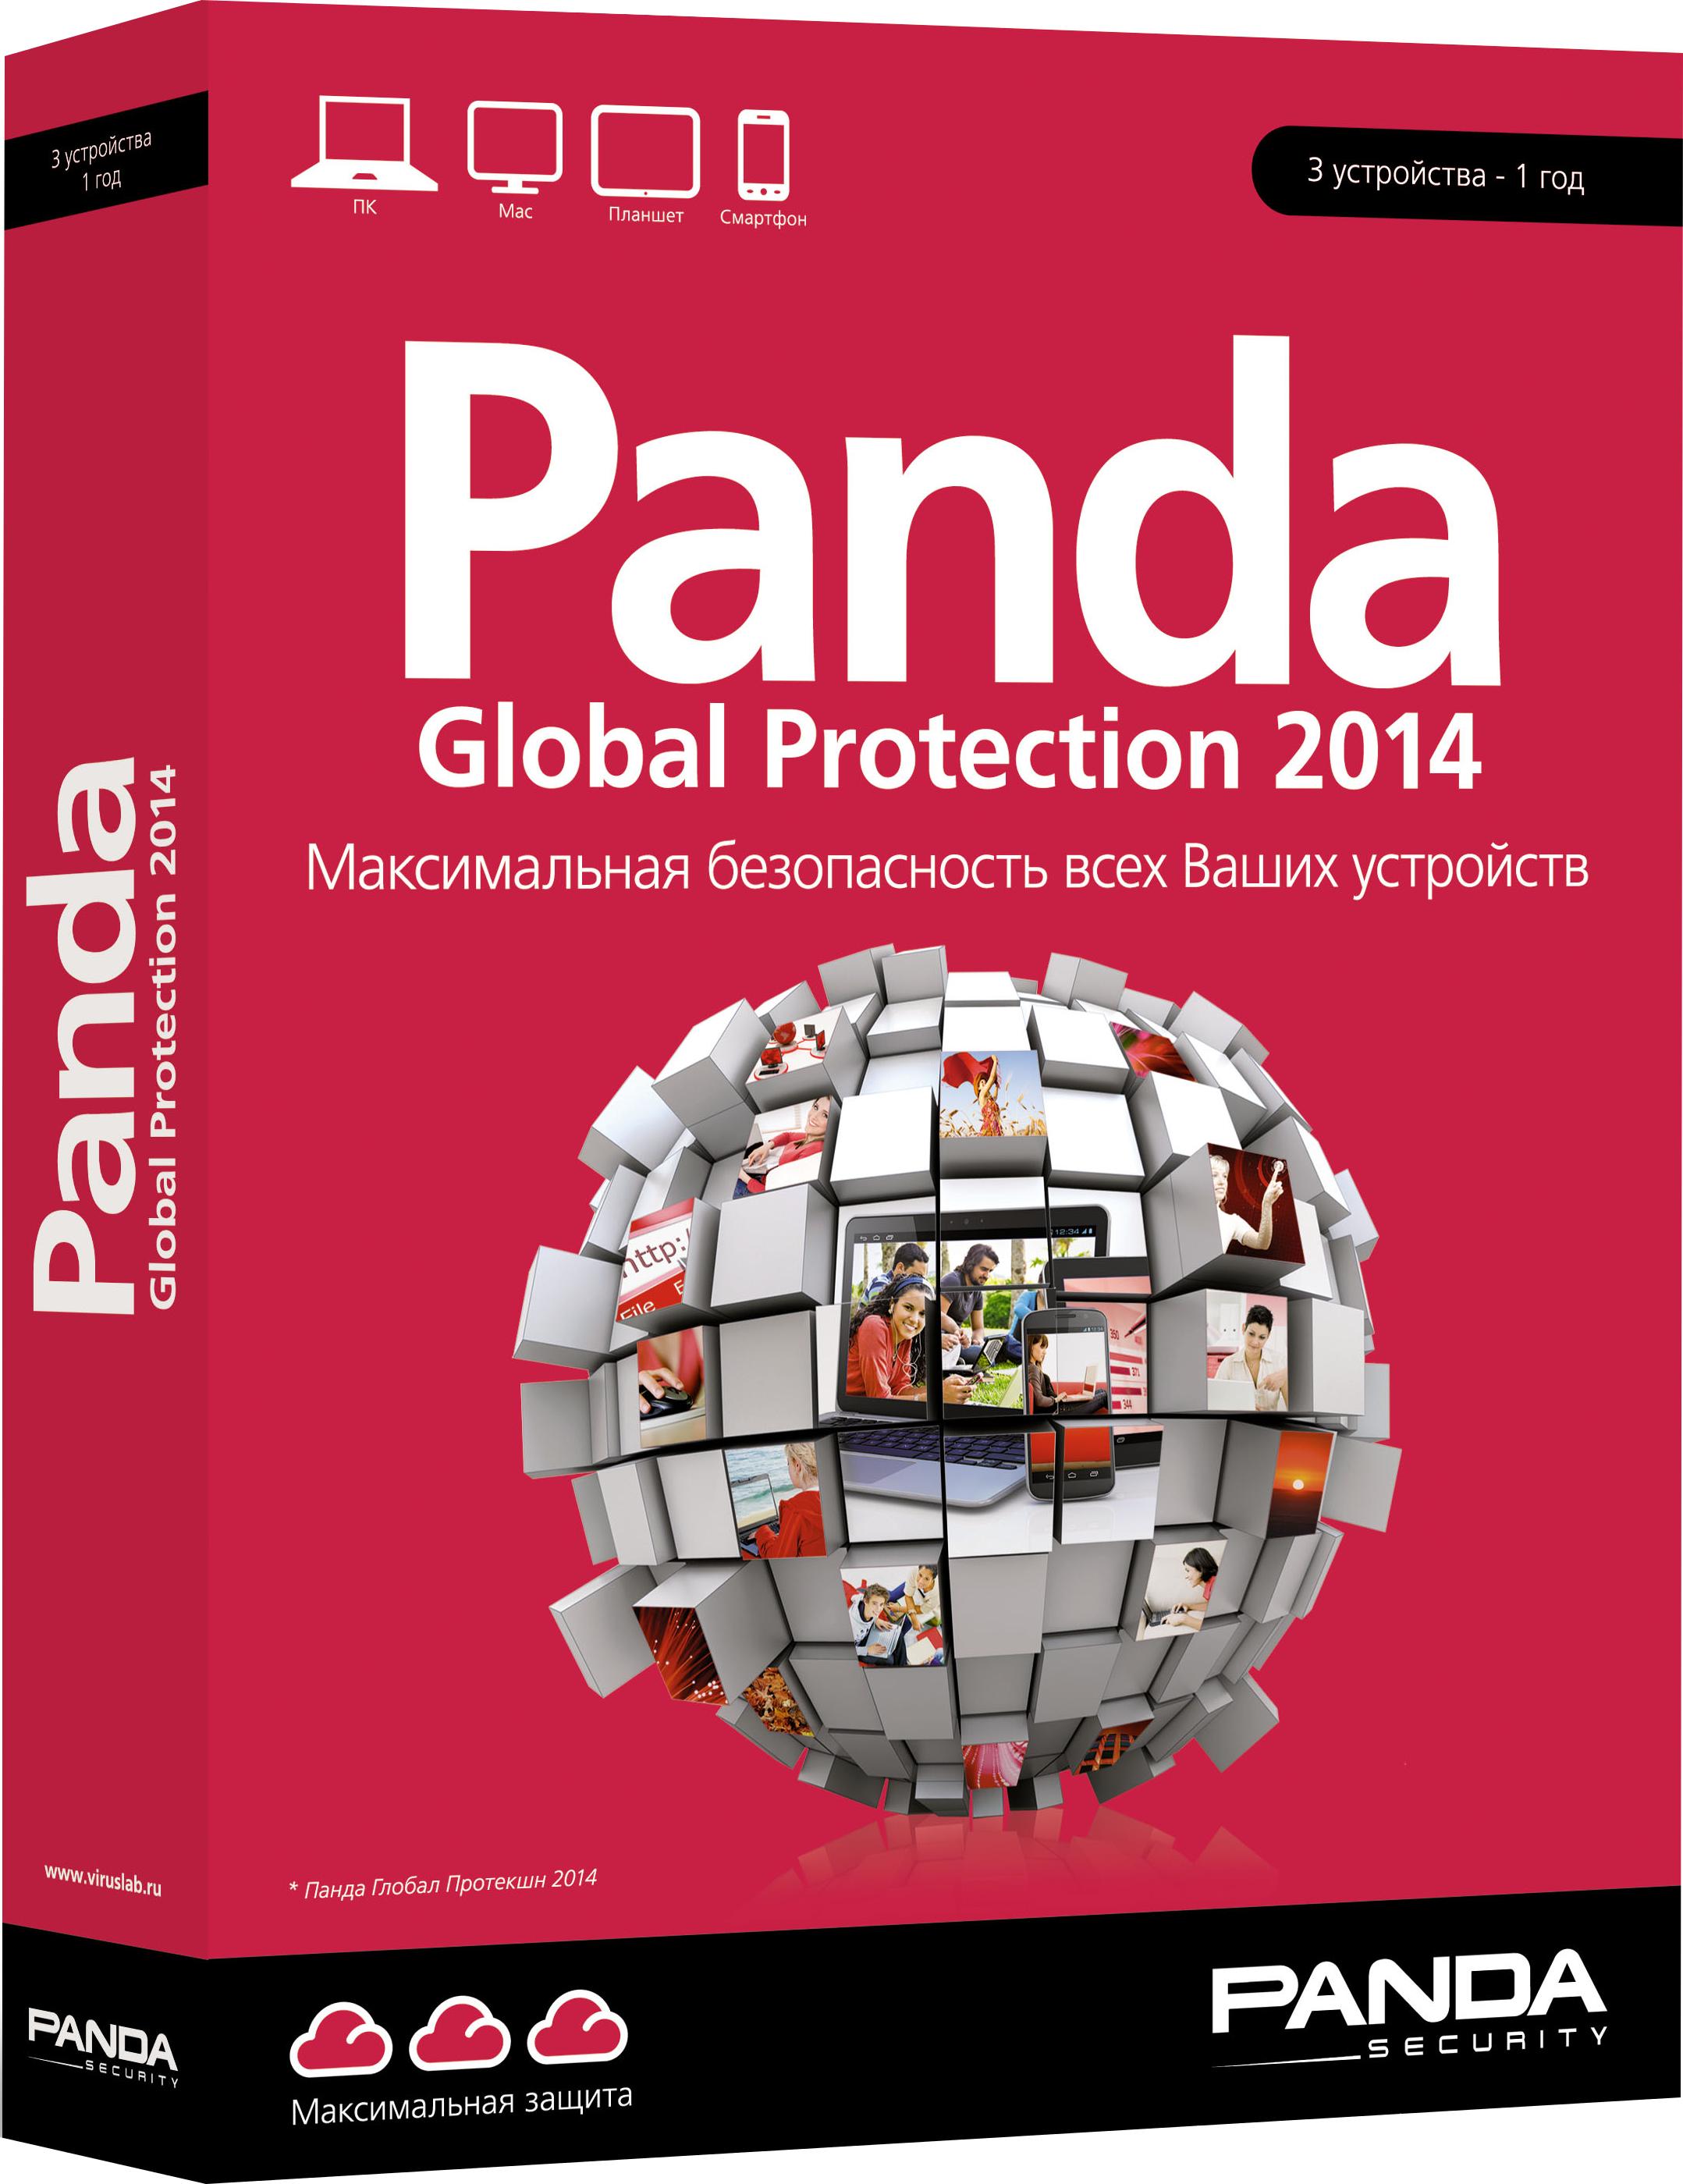 Panda Global Protection 2014 (3 устройства, 1 год)